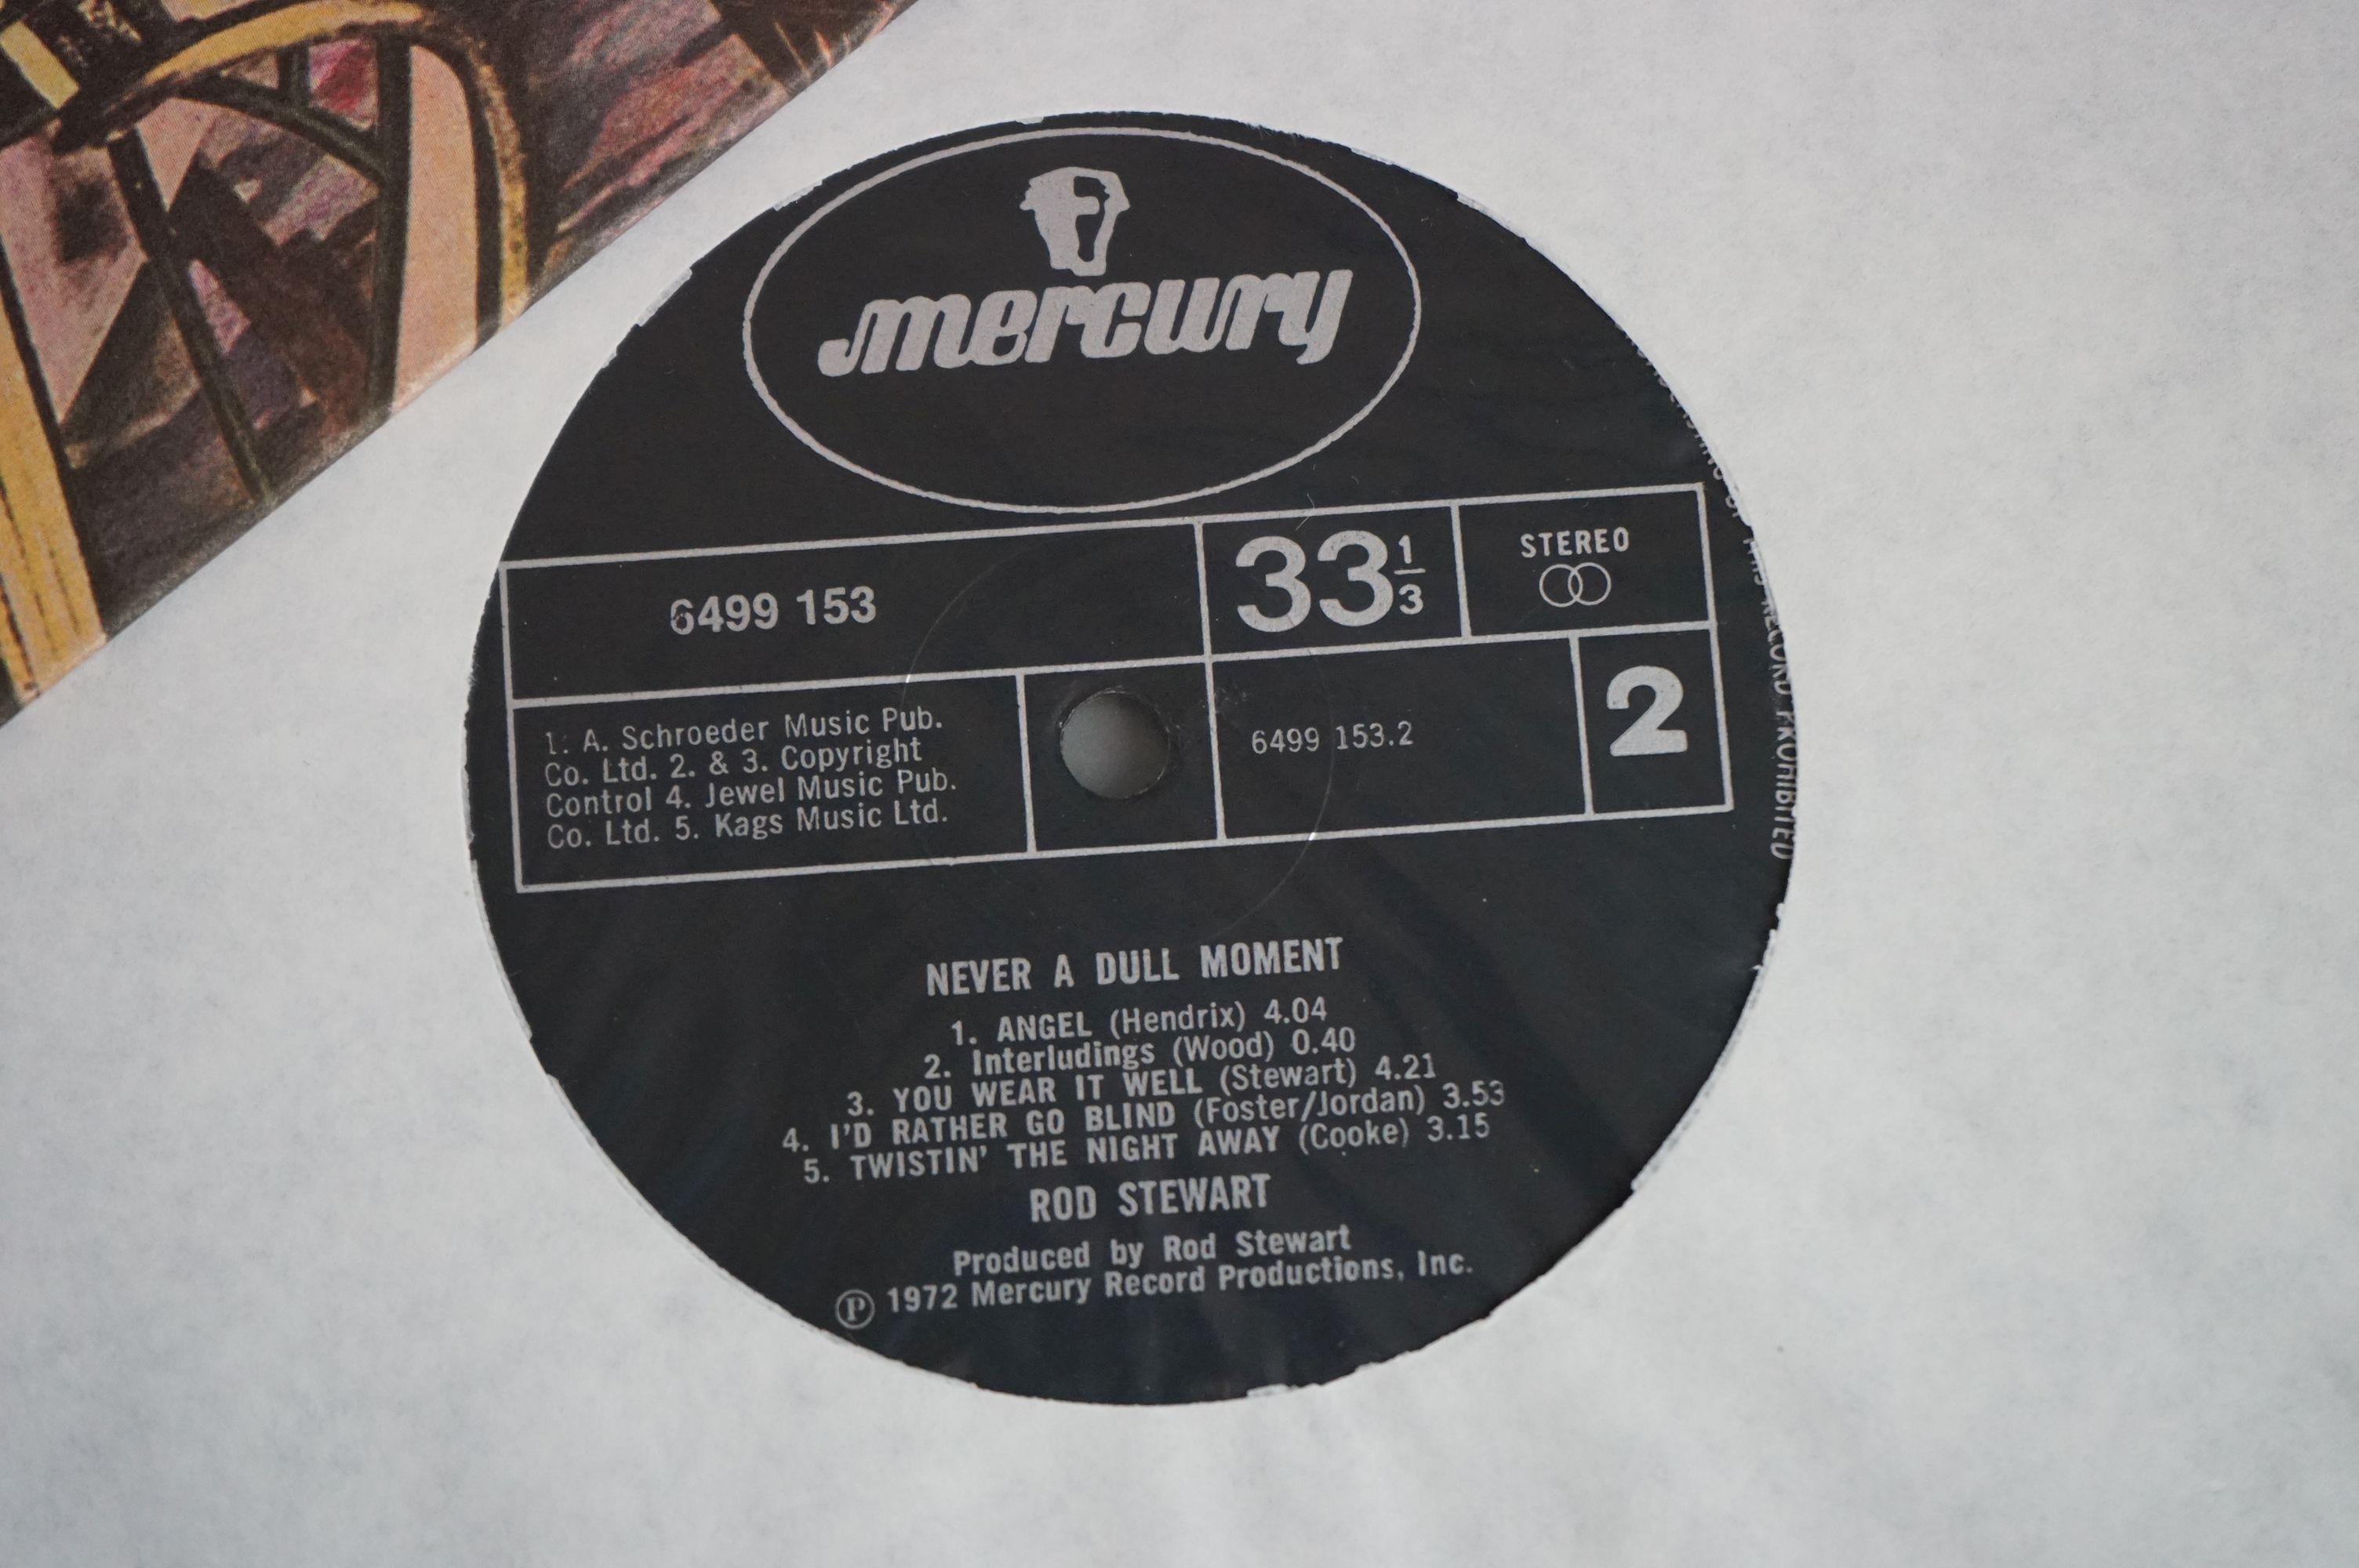 Vinyl - Rod Stewart 4 LP's to include An Old Raincoat Won't Ever Let You Down (Vertigo VO4) gatefold - Image 3 of 14